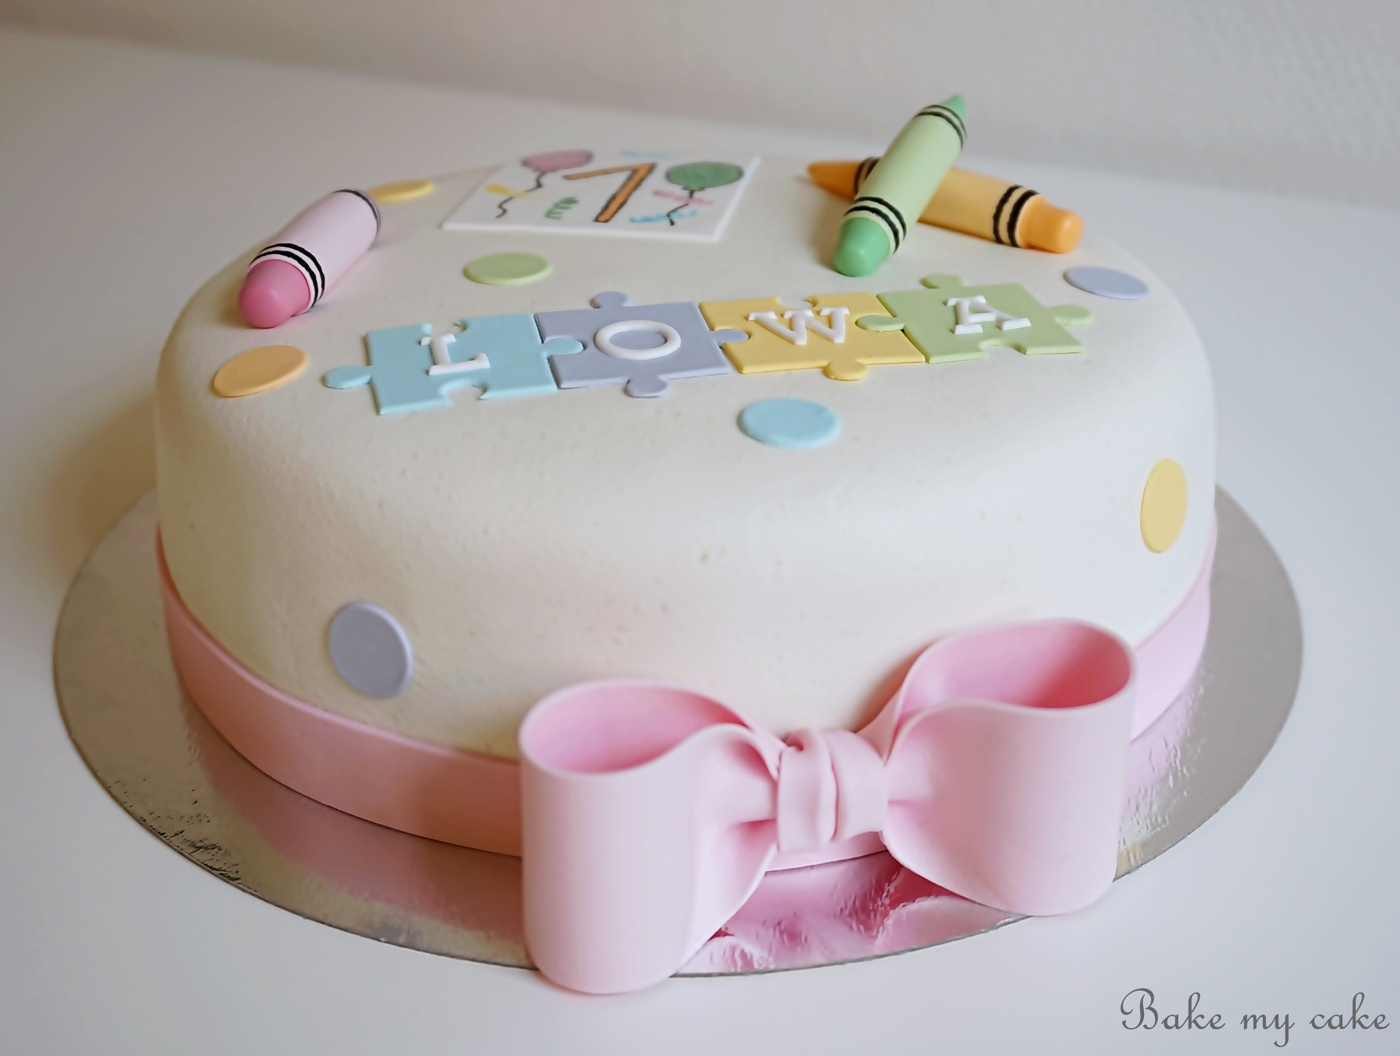 födelsedagstårta 1 år 1 årstårta | Bake my cake i Norrköping födelsedagstårta 1 år